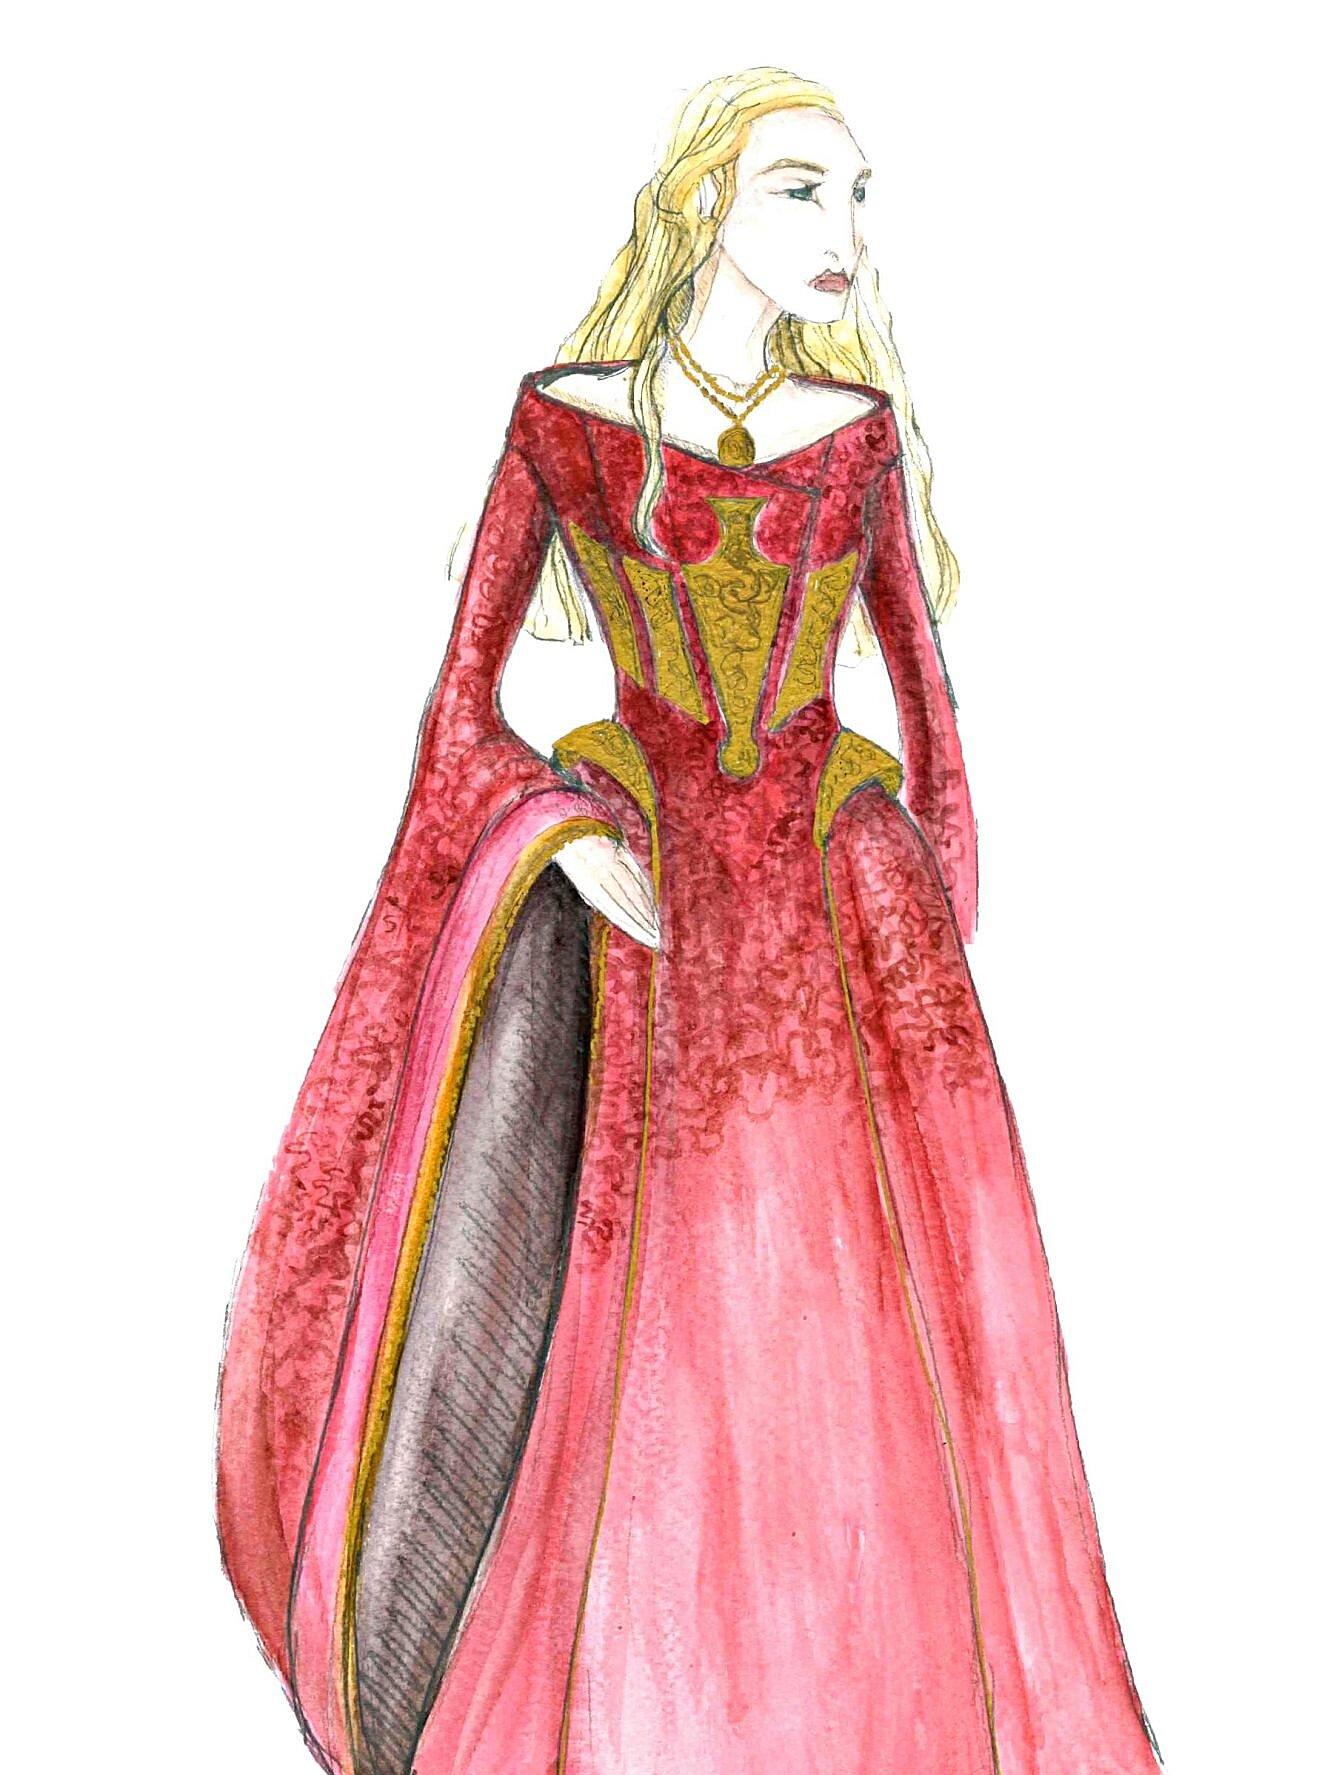 Game Of Thrones Costume Designer On Dressing The Seven Kingdoms Ew Com